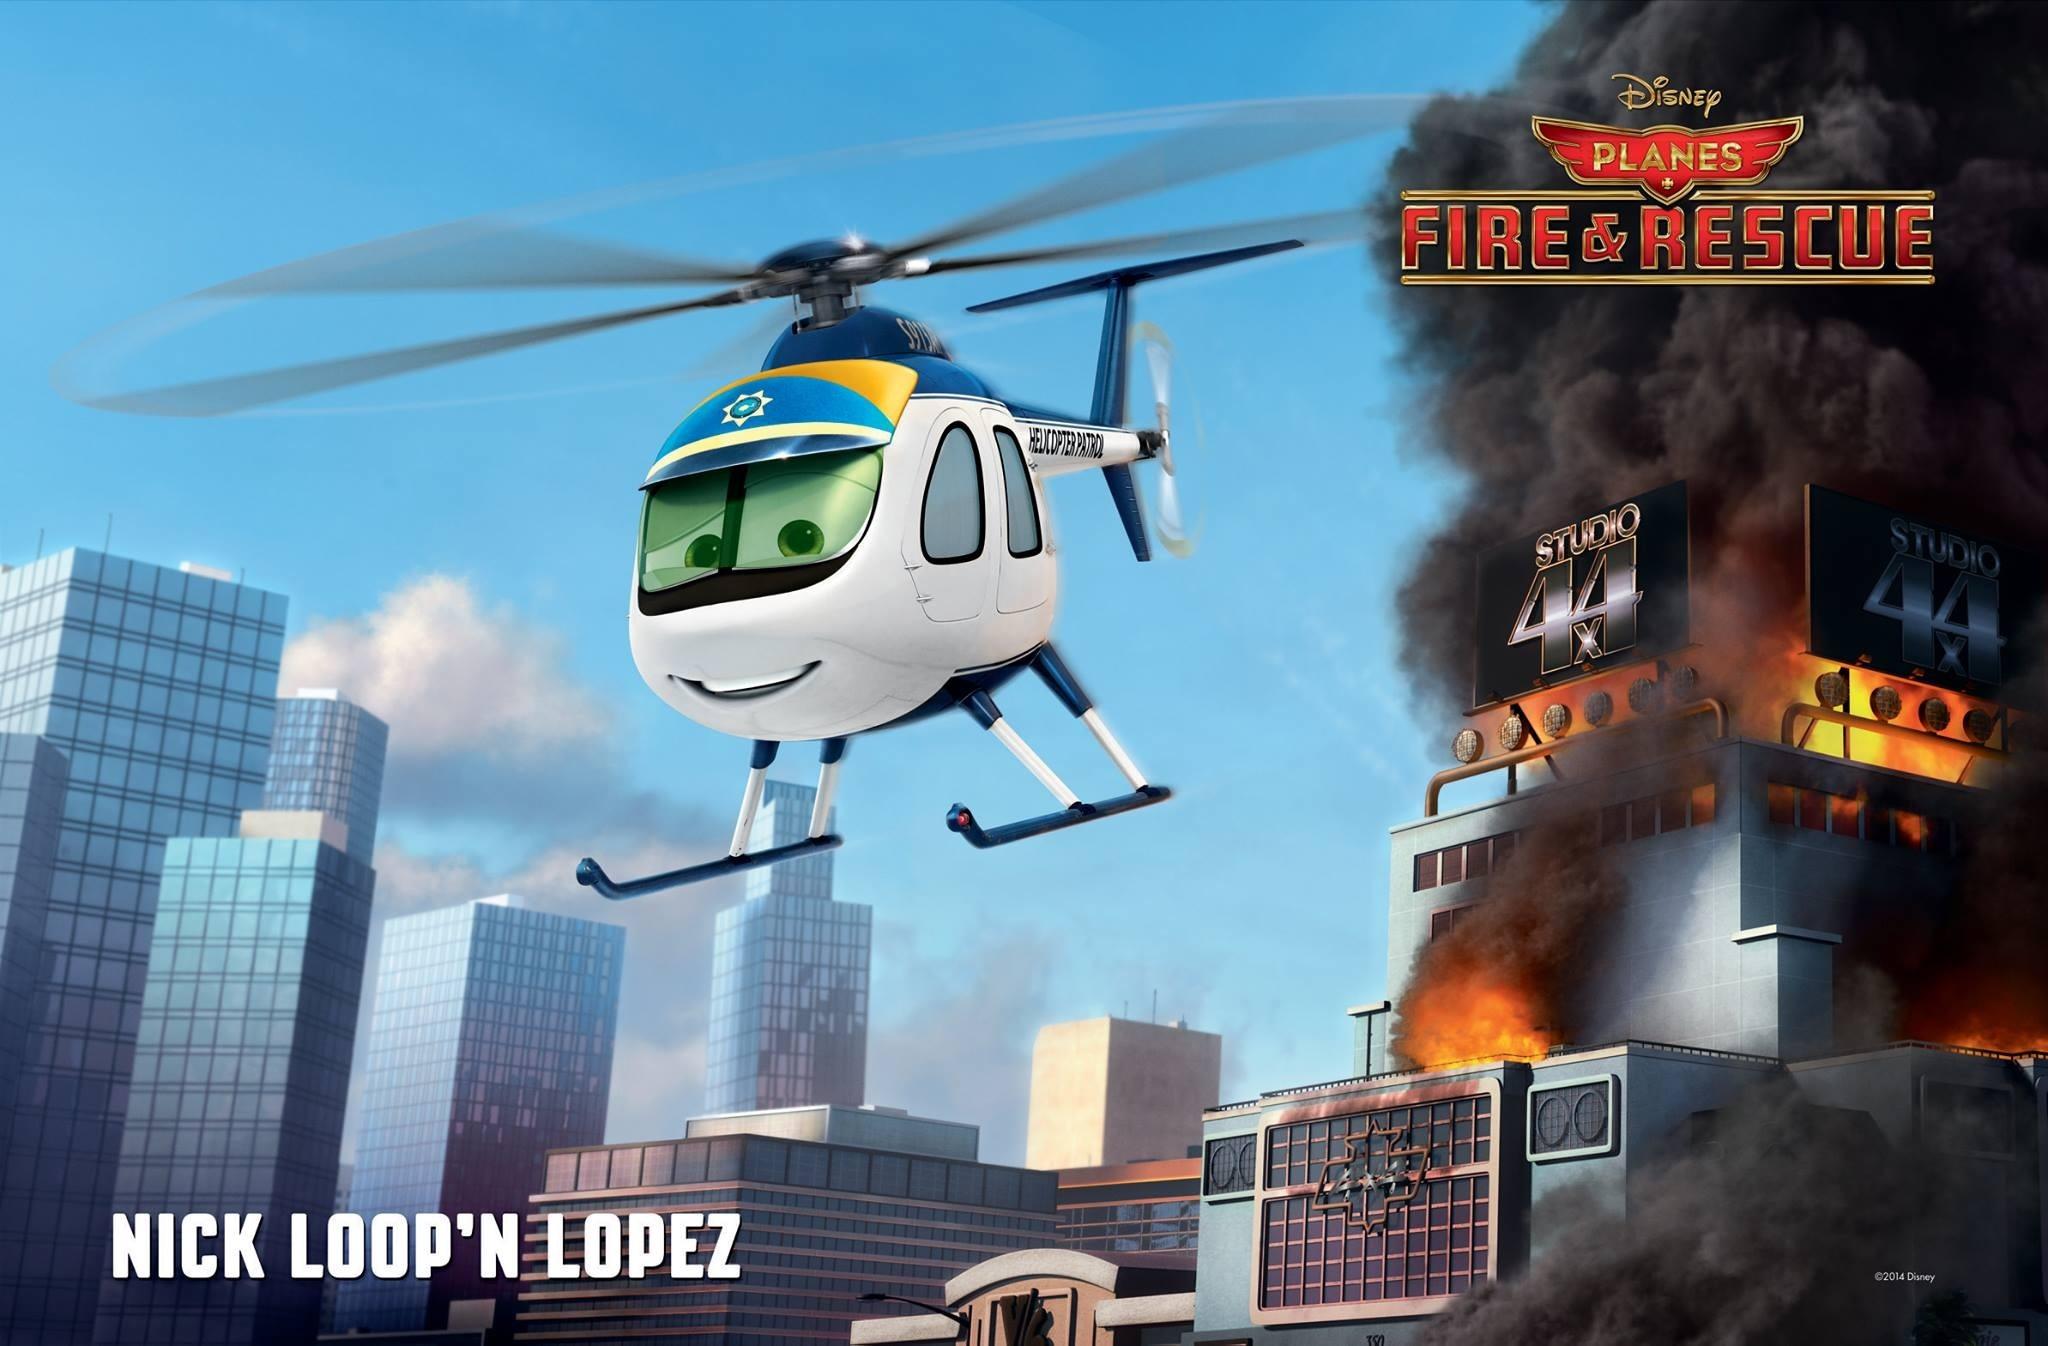 Pixar Disney Planes mission canadair Nick